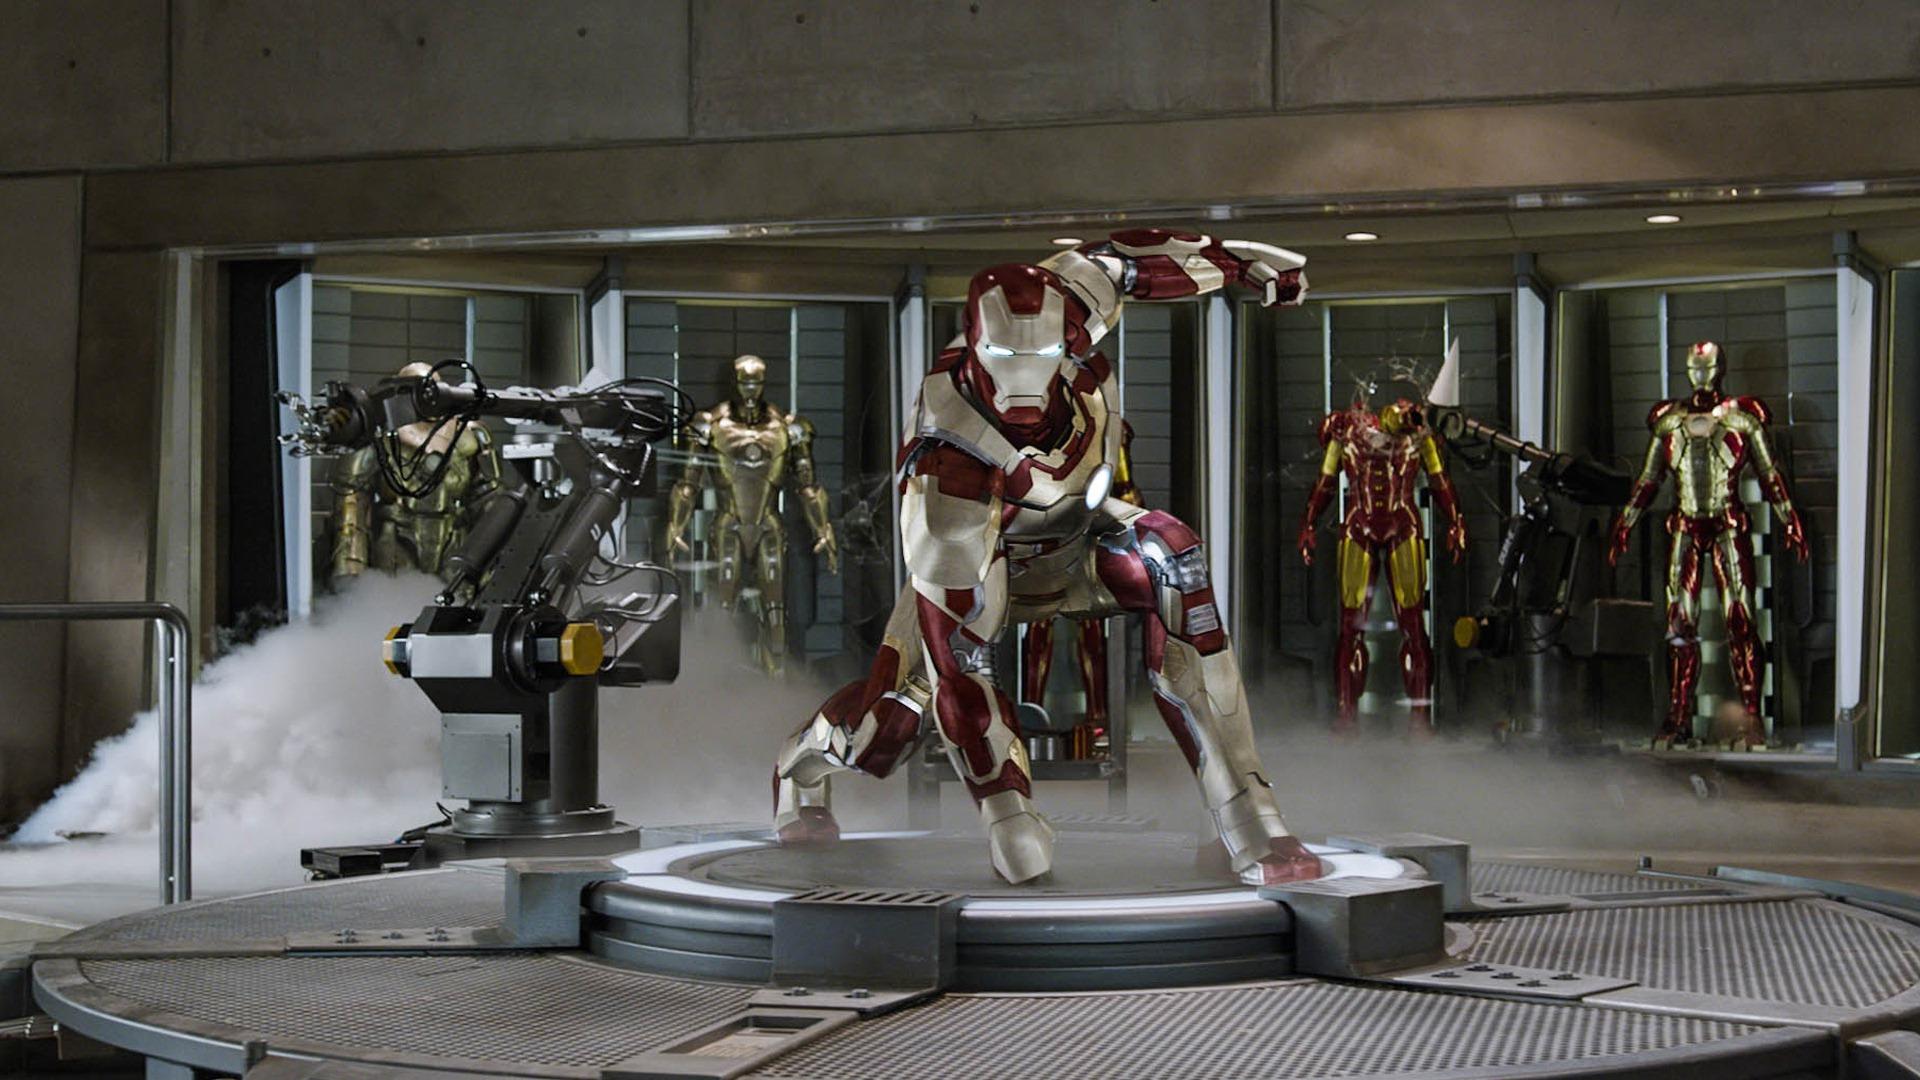 Iron Man 3 Hd Wallpapers 9 1920x1080 Wallpaper Download Iron